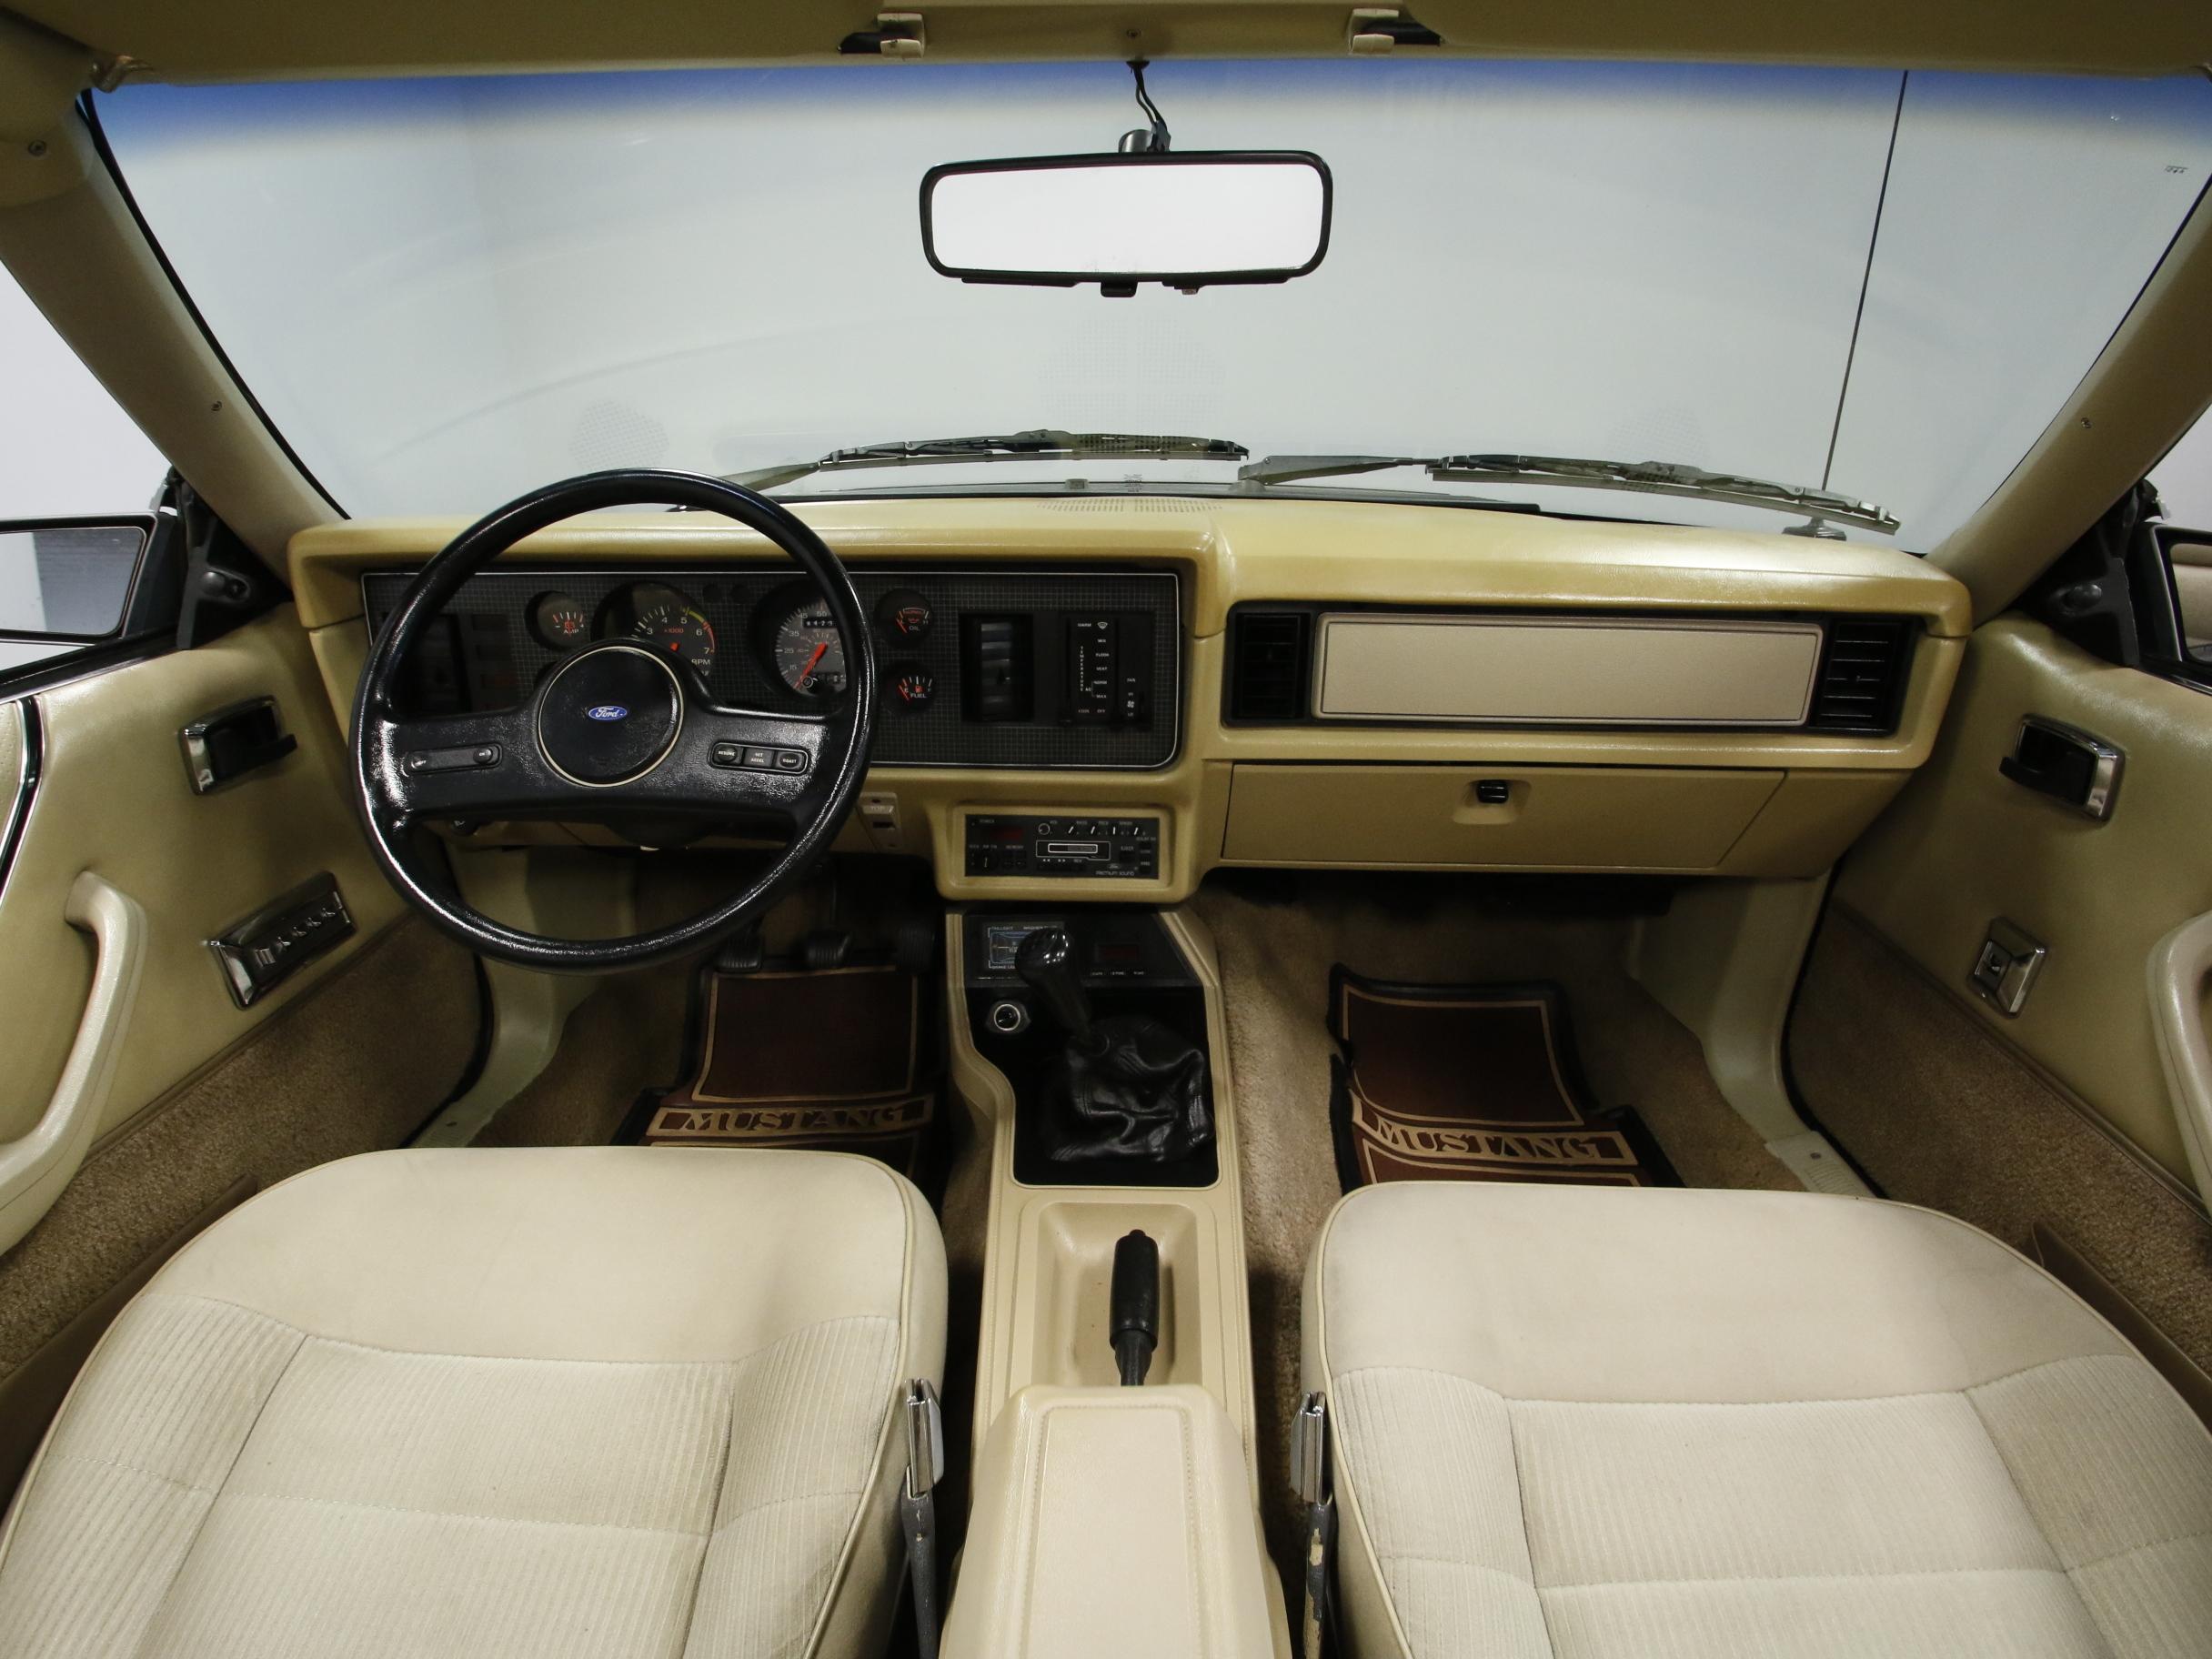 4163-CHA | 1986 Ford Mustang LX 5.0 | Streetside Classics